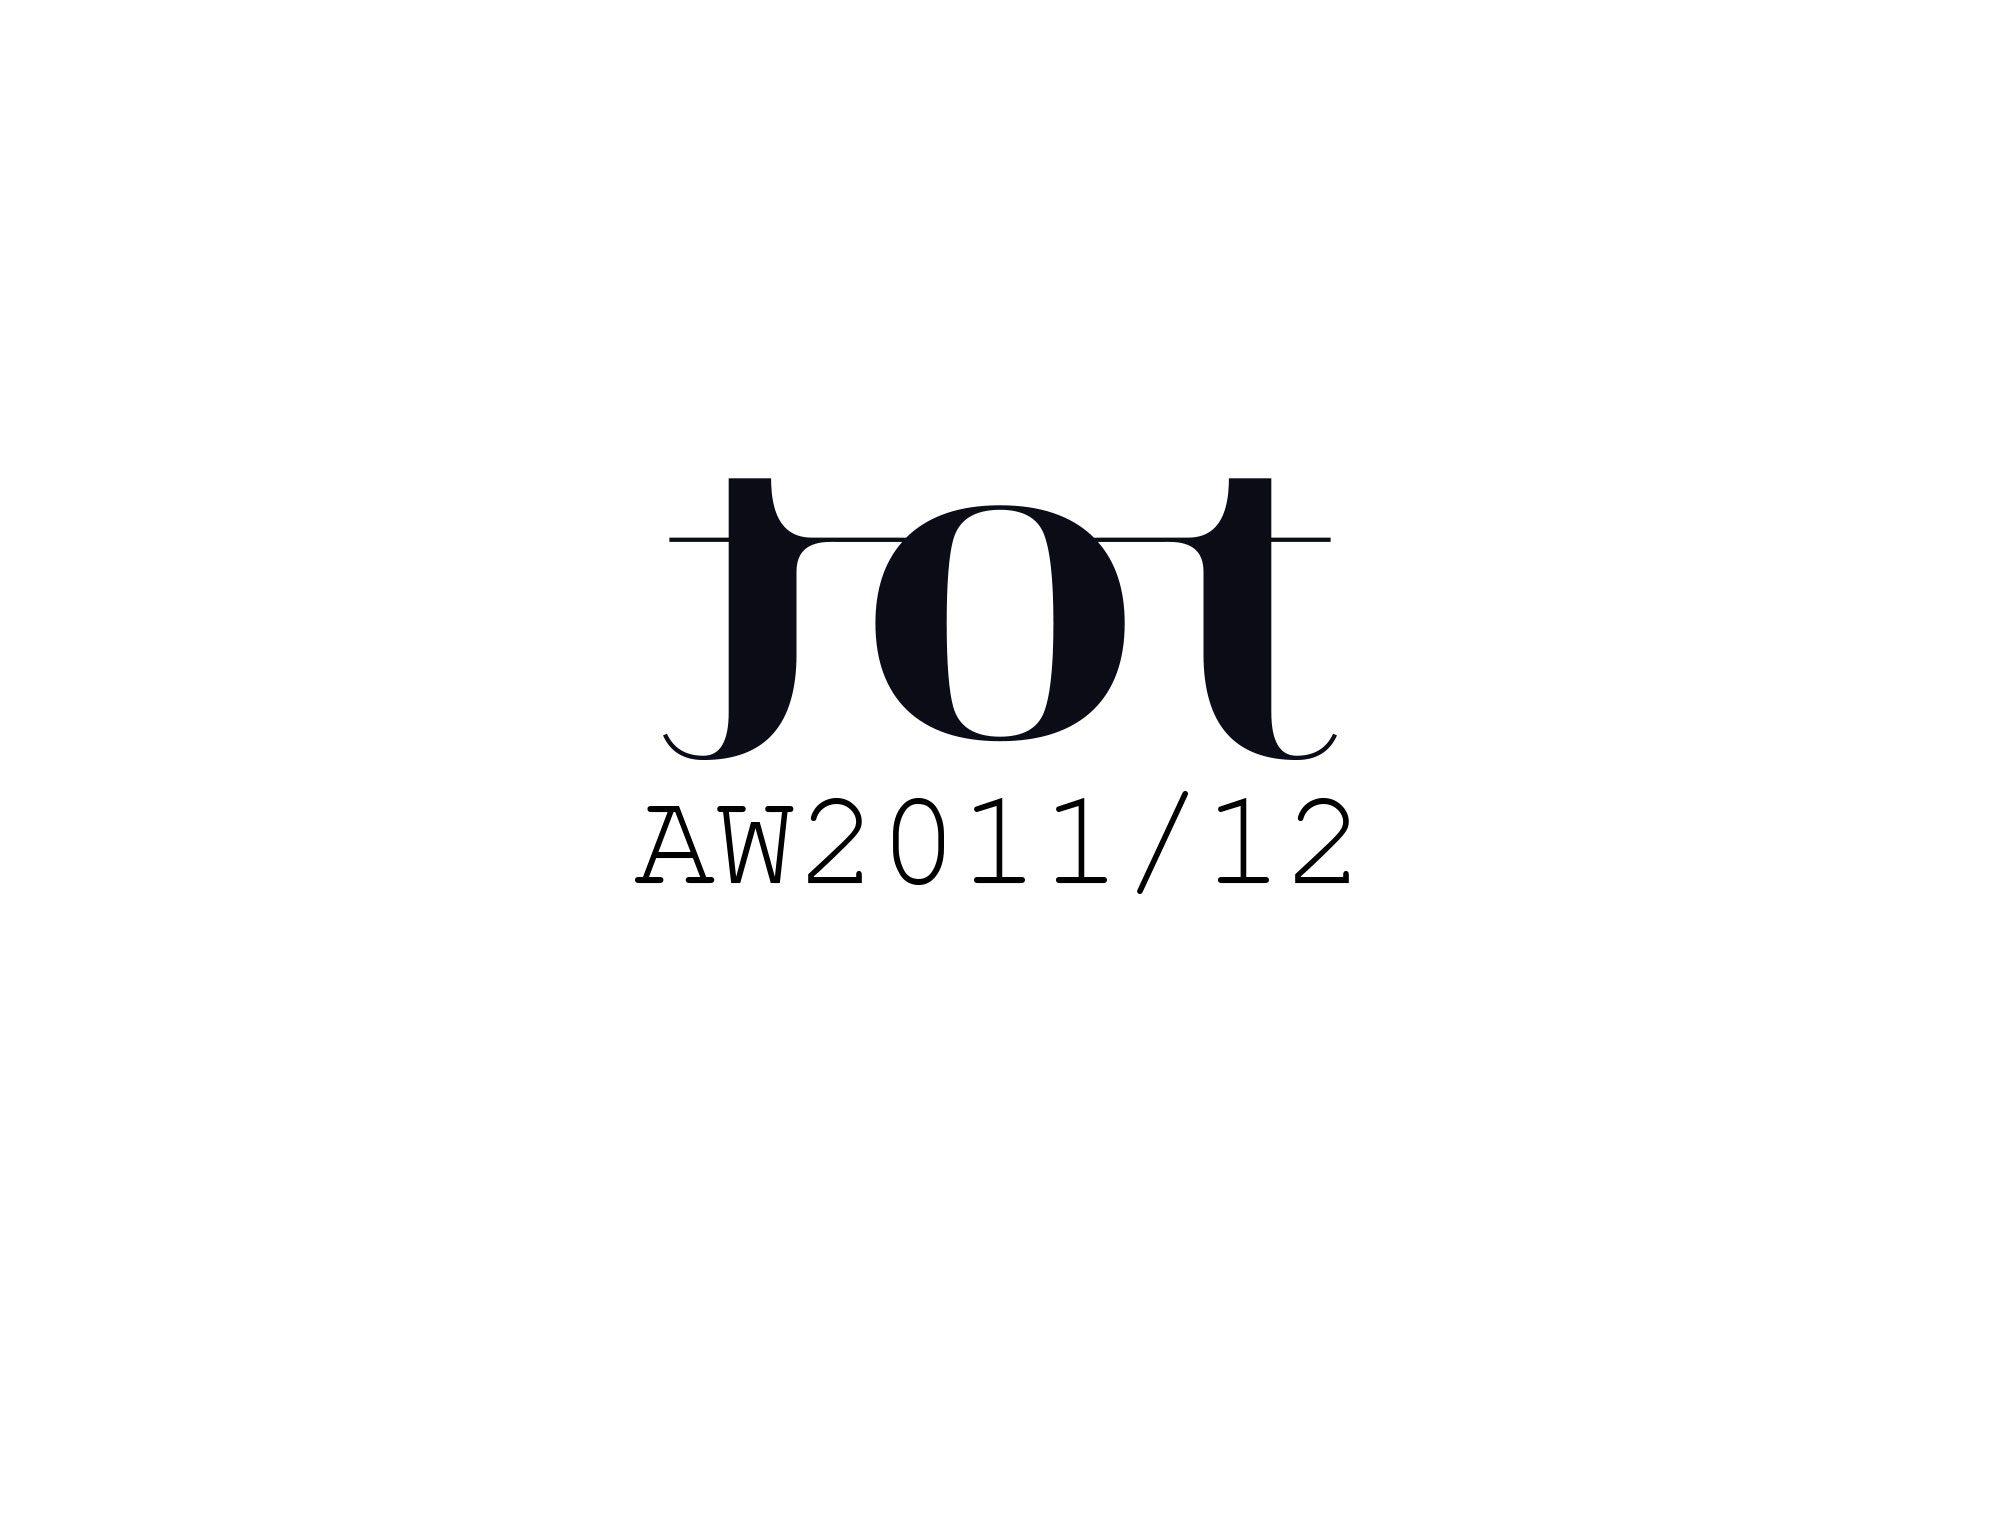 AW 2011/12